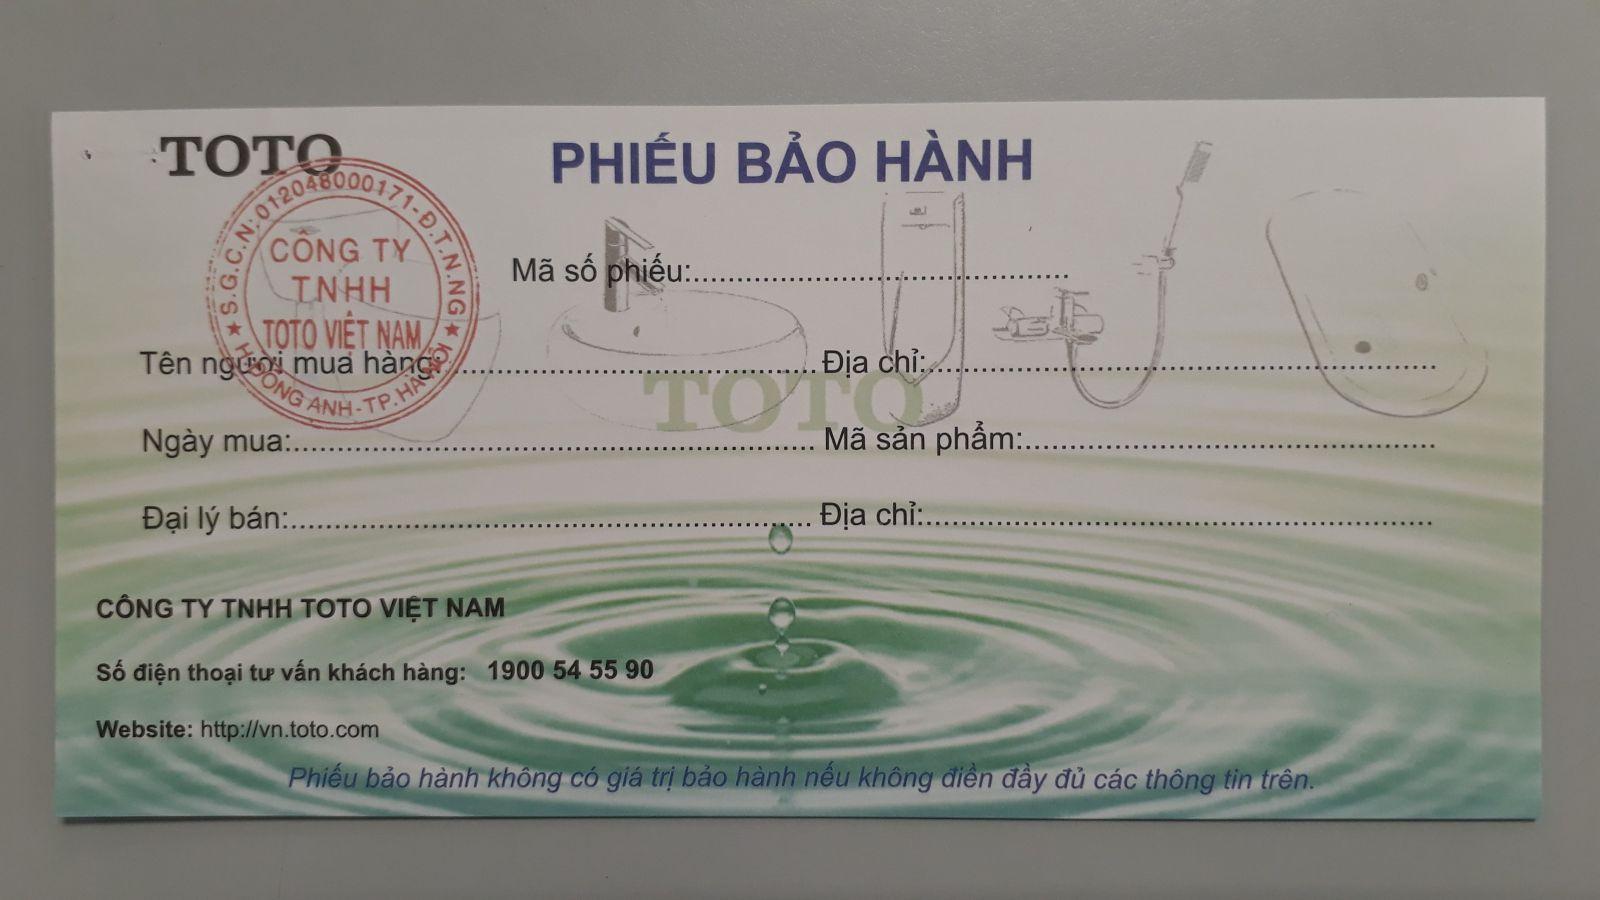 phieu bao hanh toto